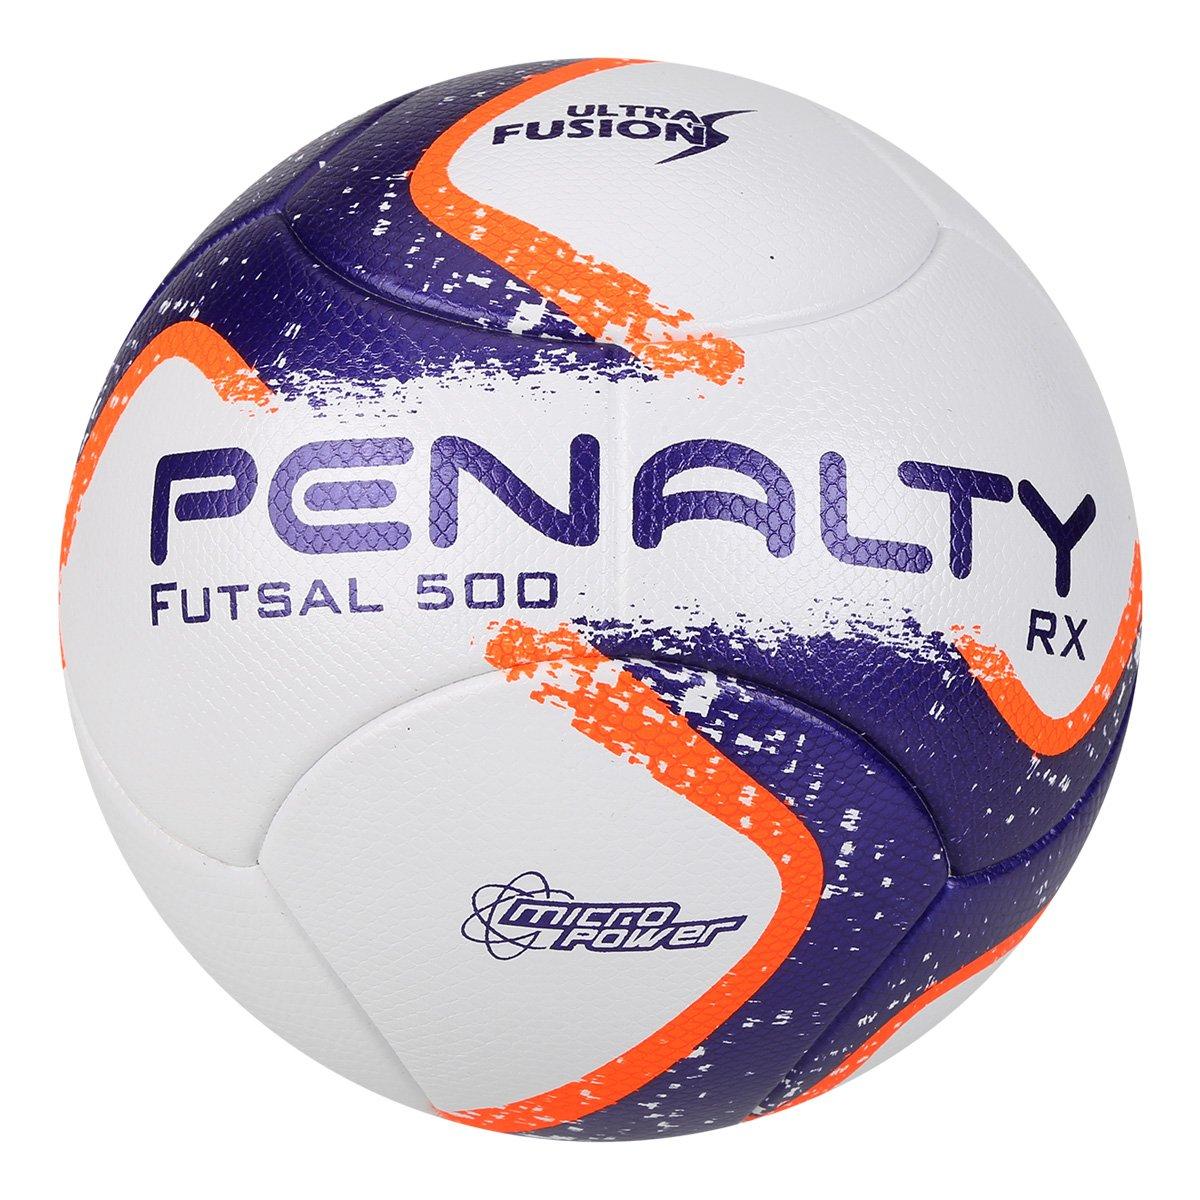 2c84ed24b3 Bola Futsal Penalty RX 500 R1 Fusion VIII